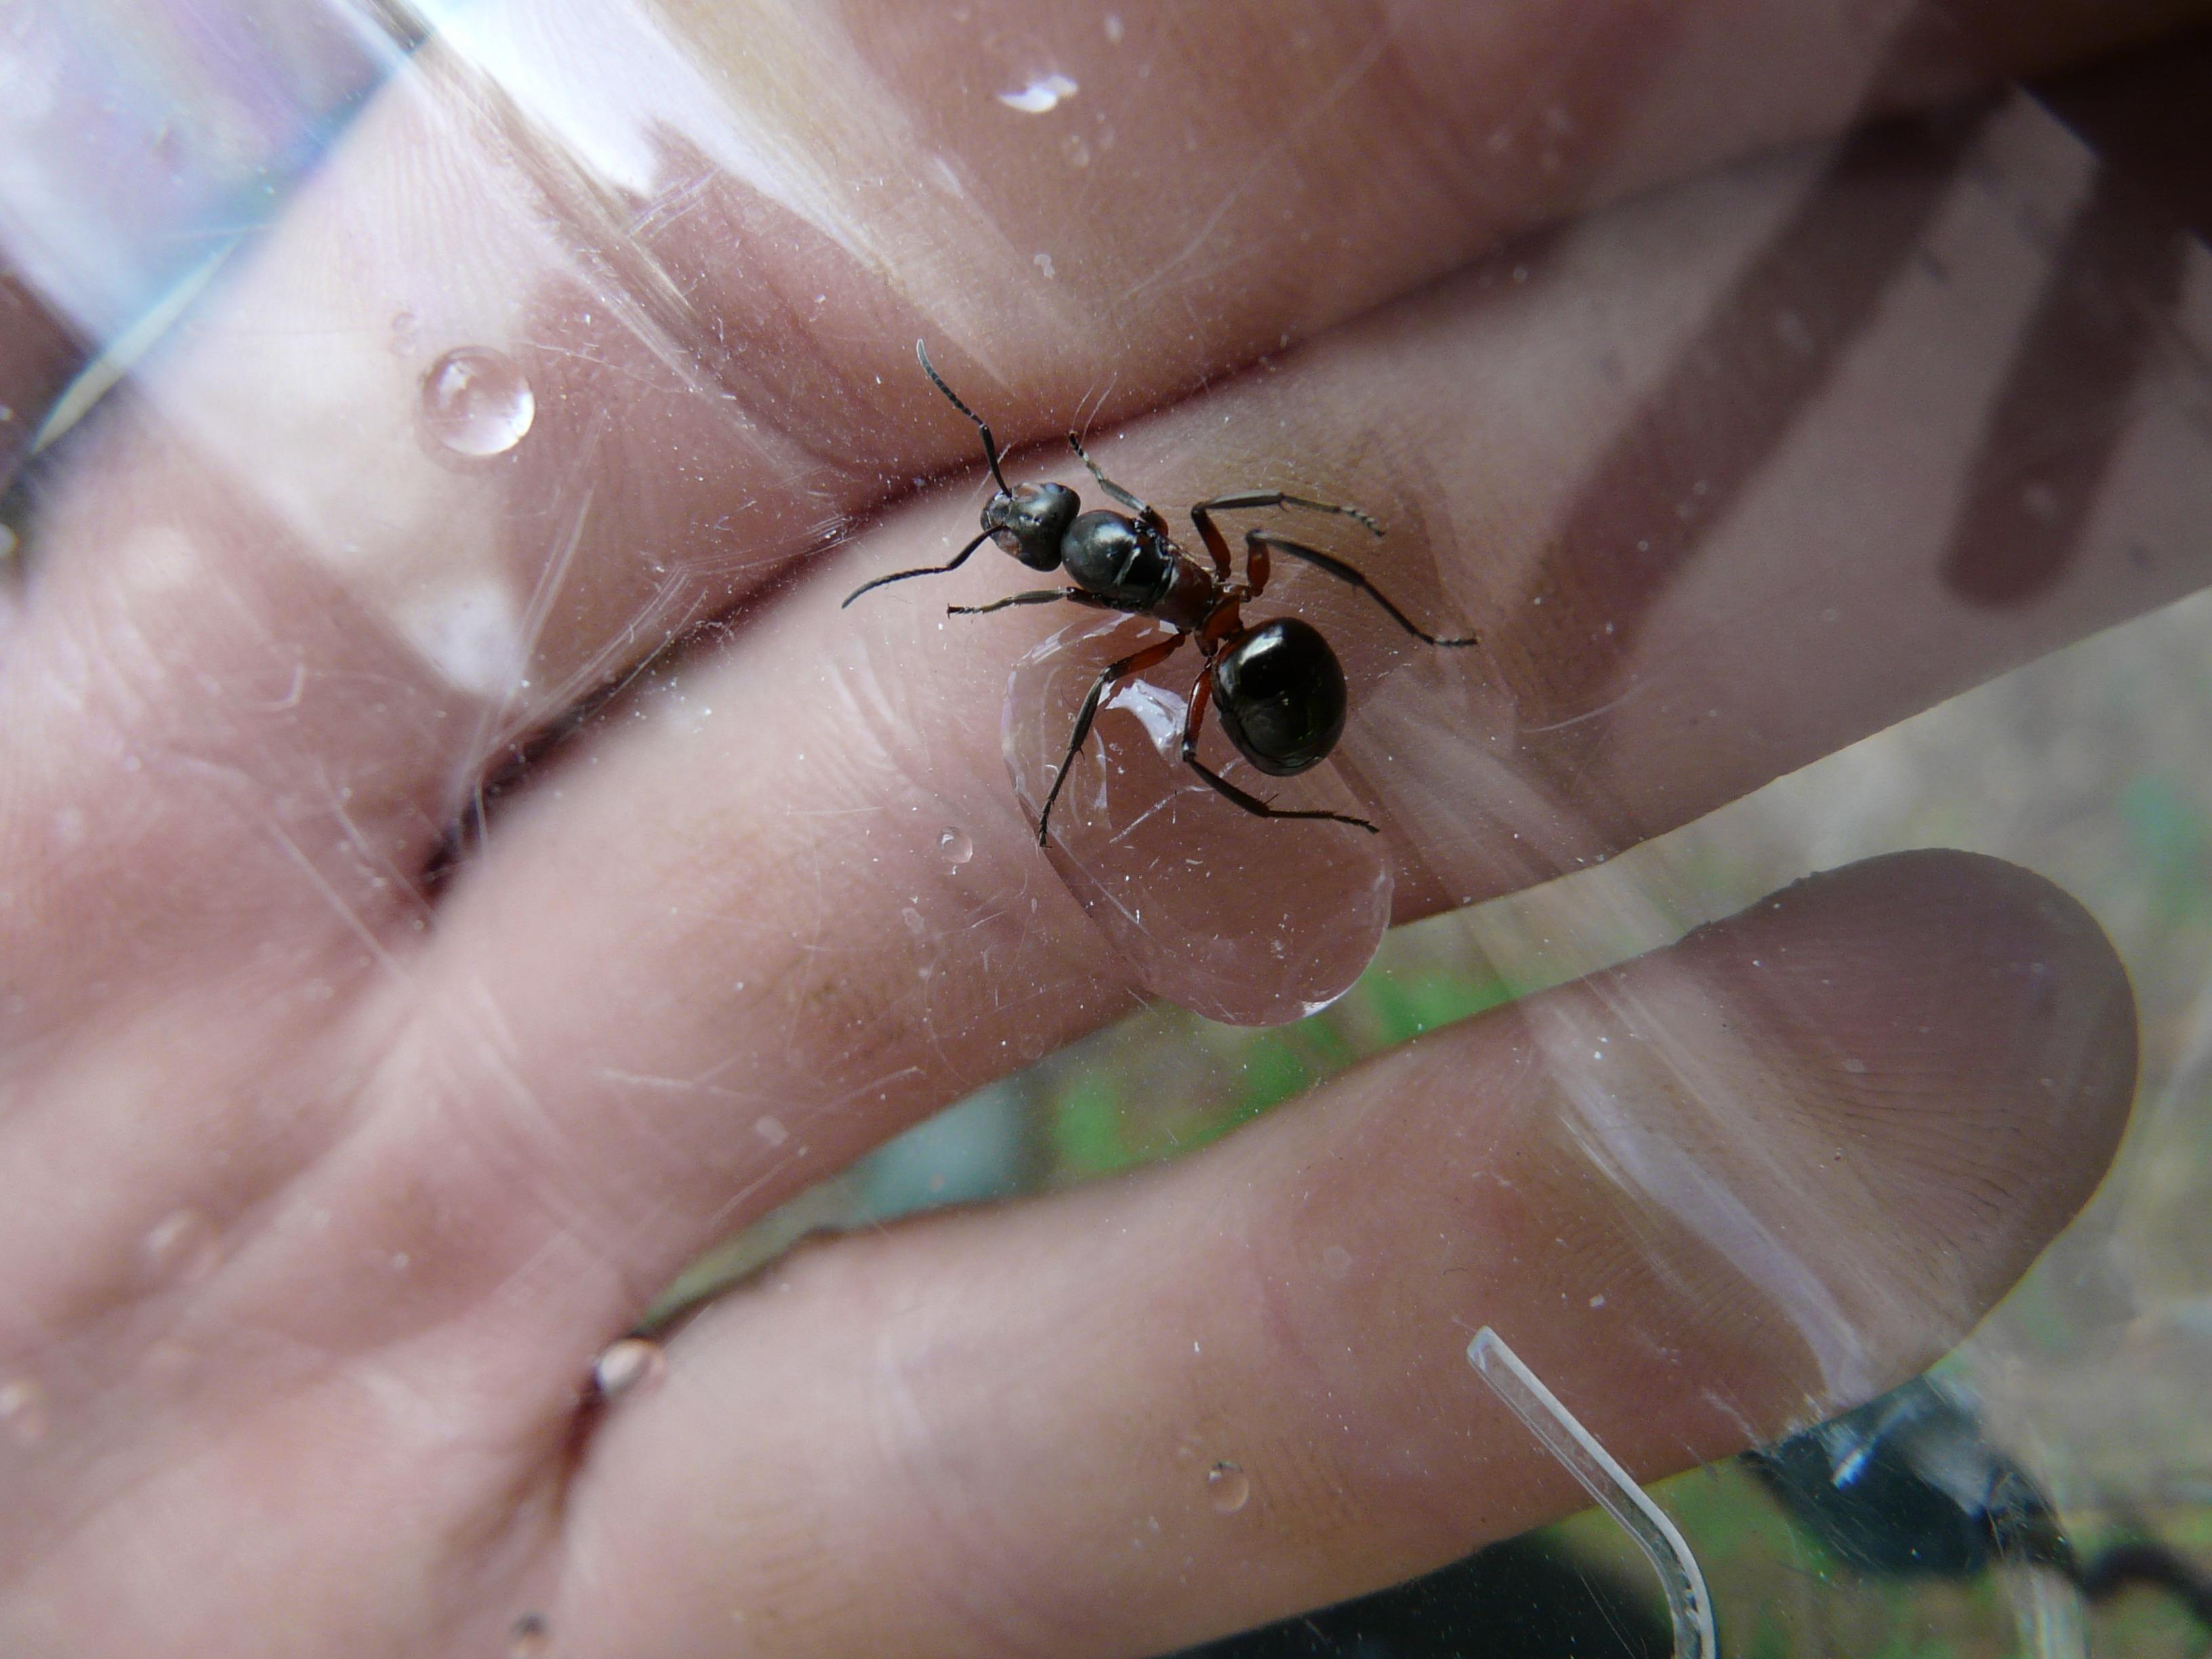 Fotos Gratis Mano Naturaleza Dedo Insecto Uña Fauna